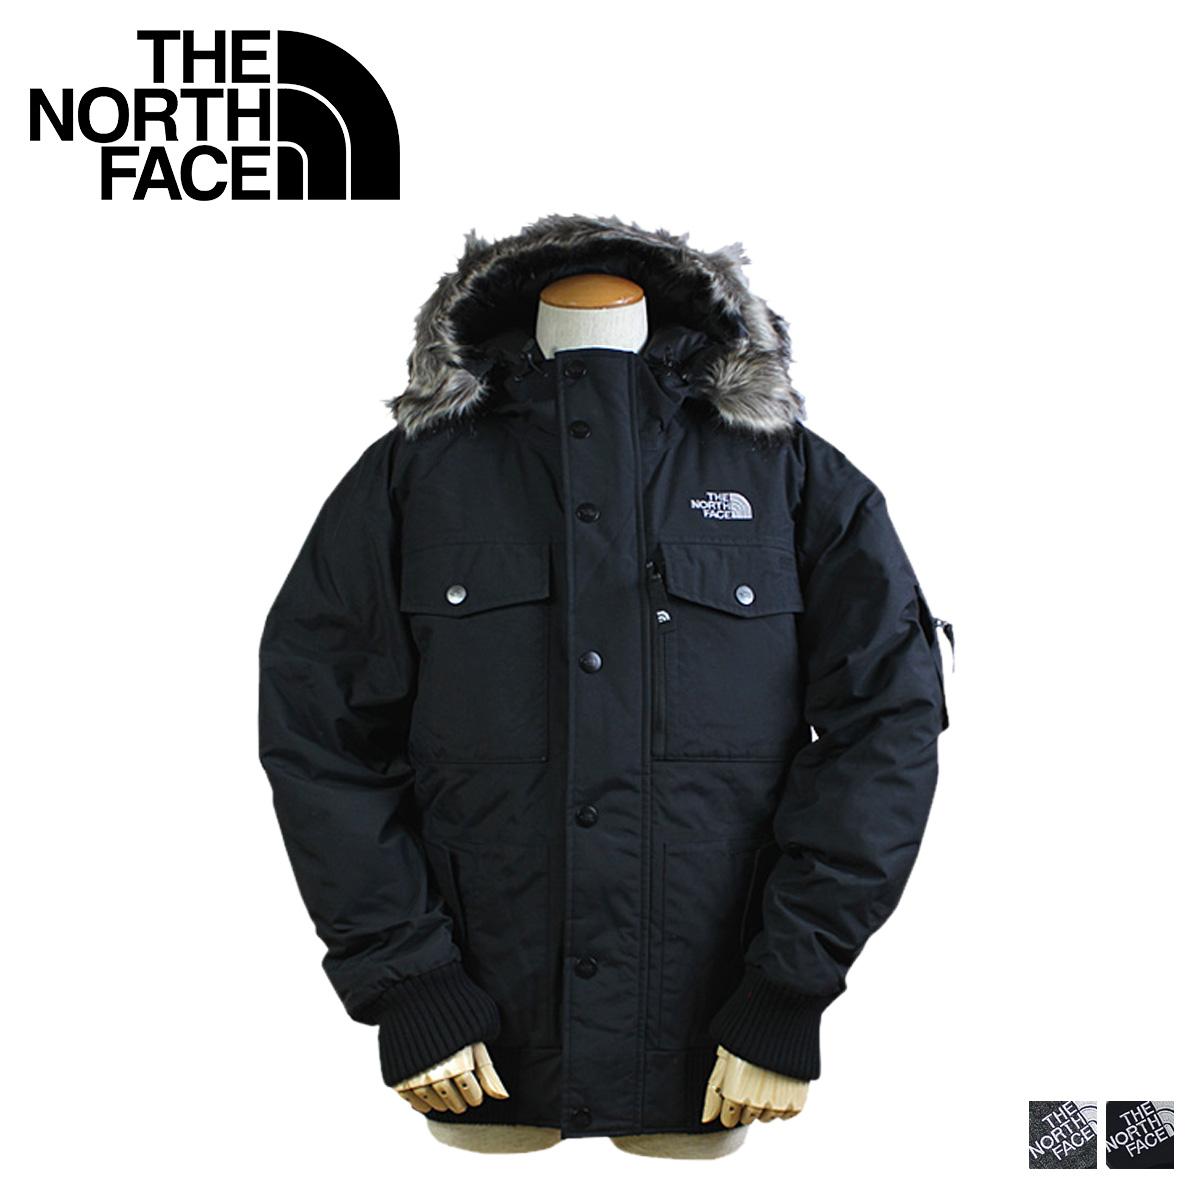 North face down jacket men sale